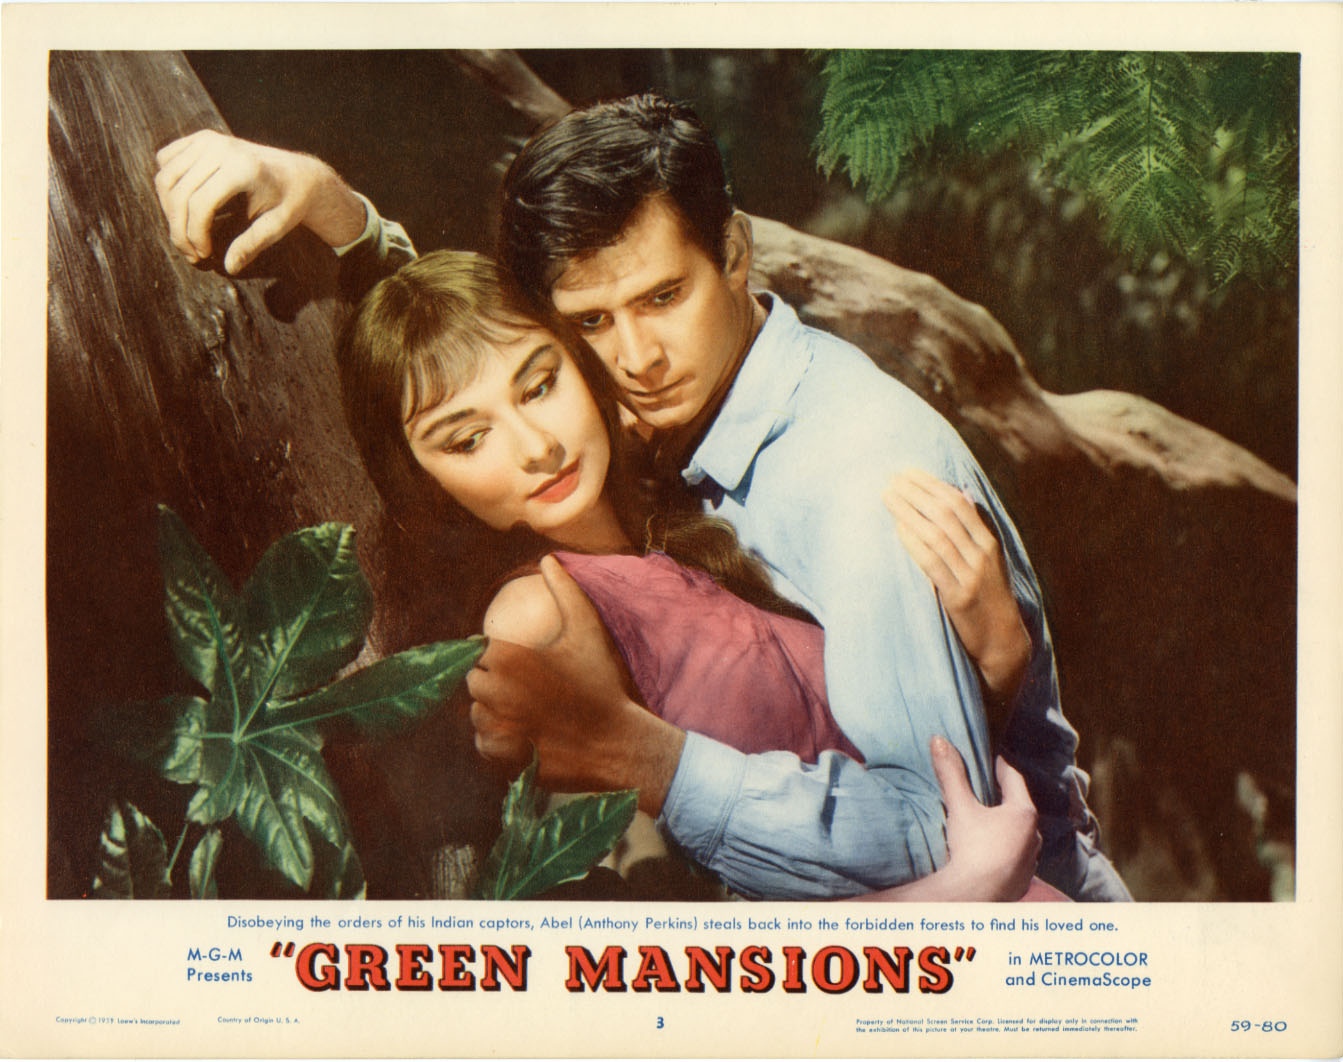 green_mansions_1959.jpg